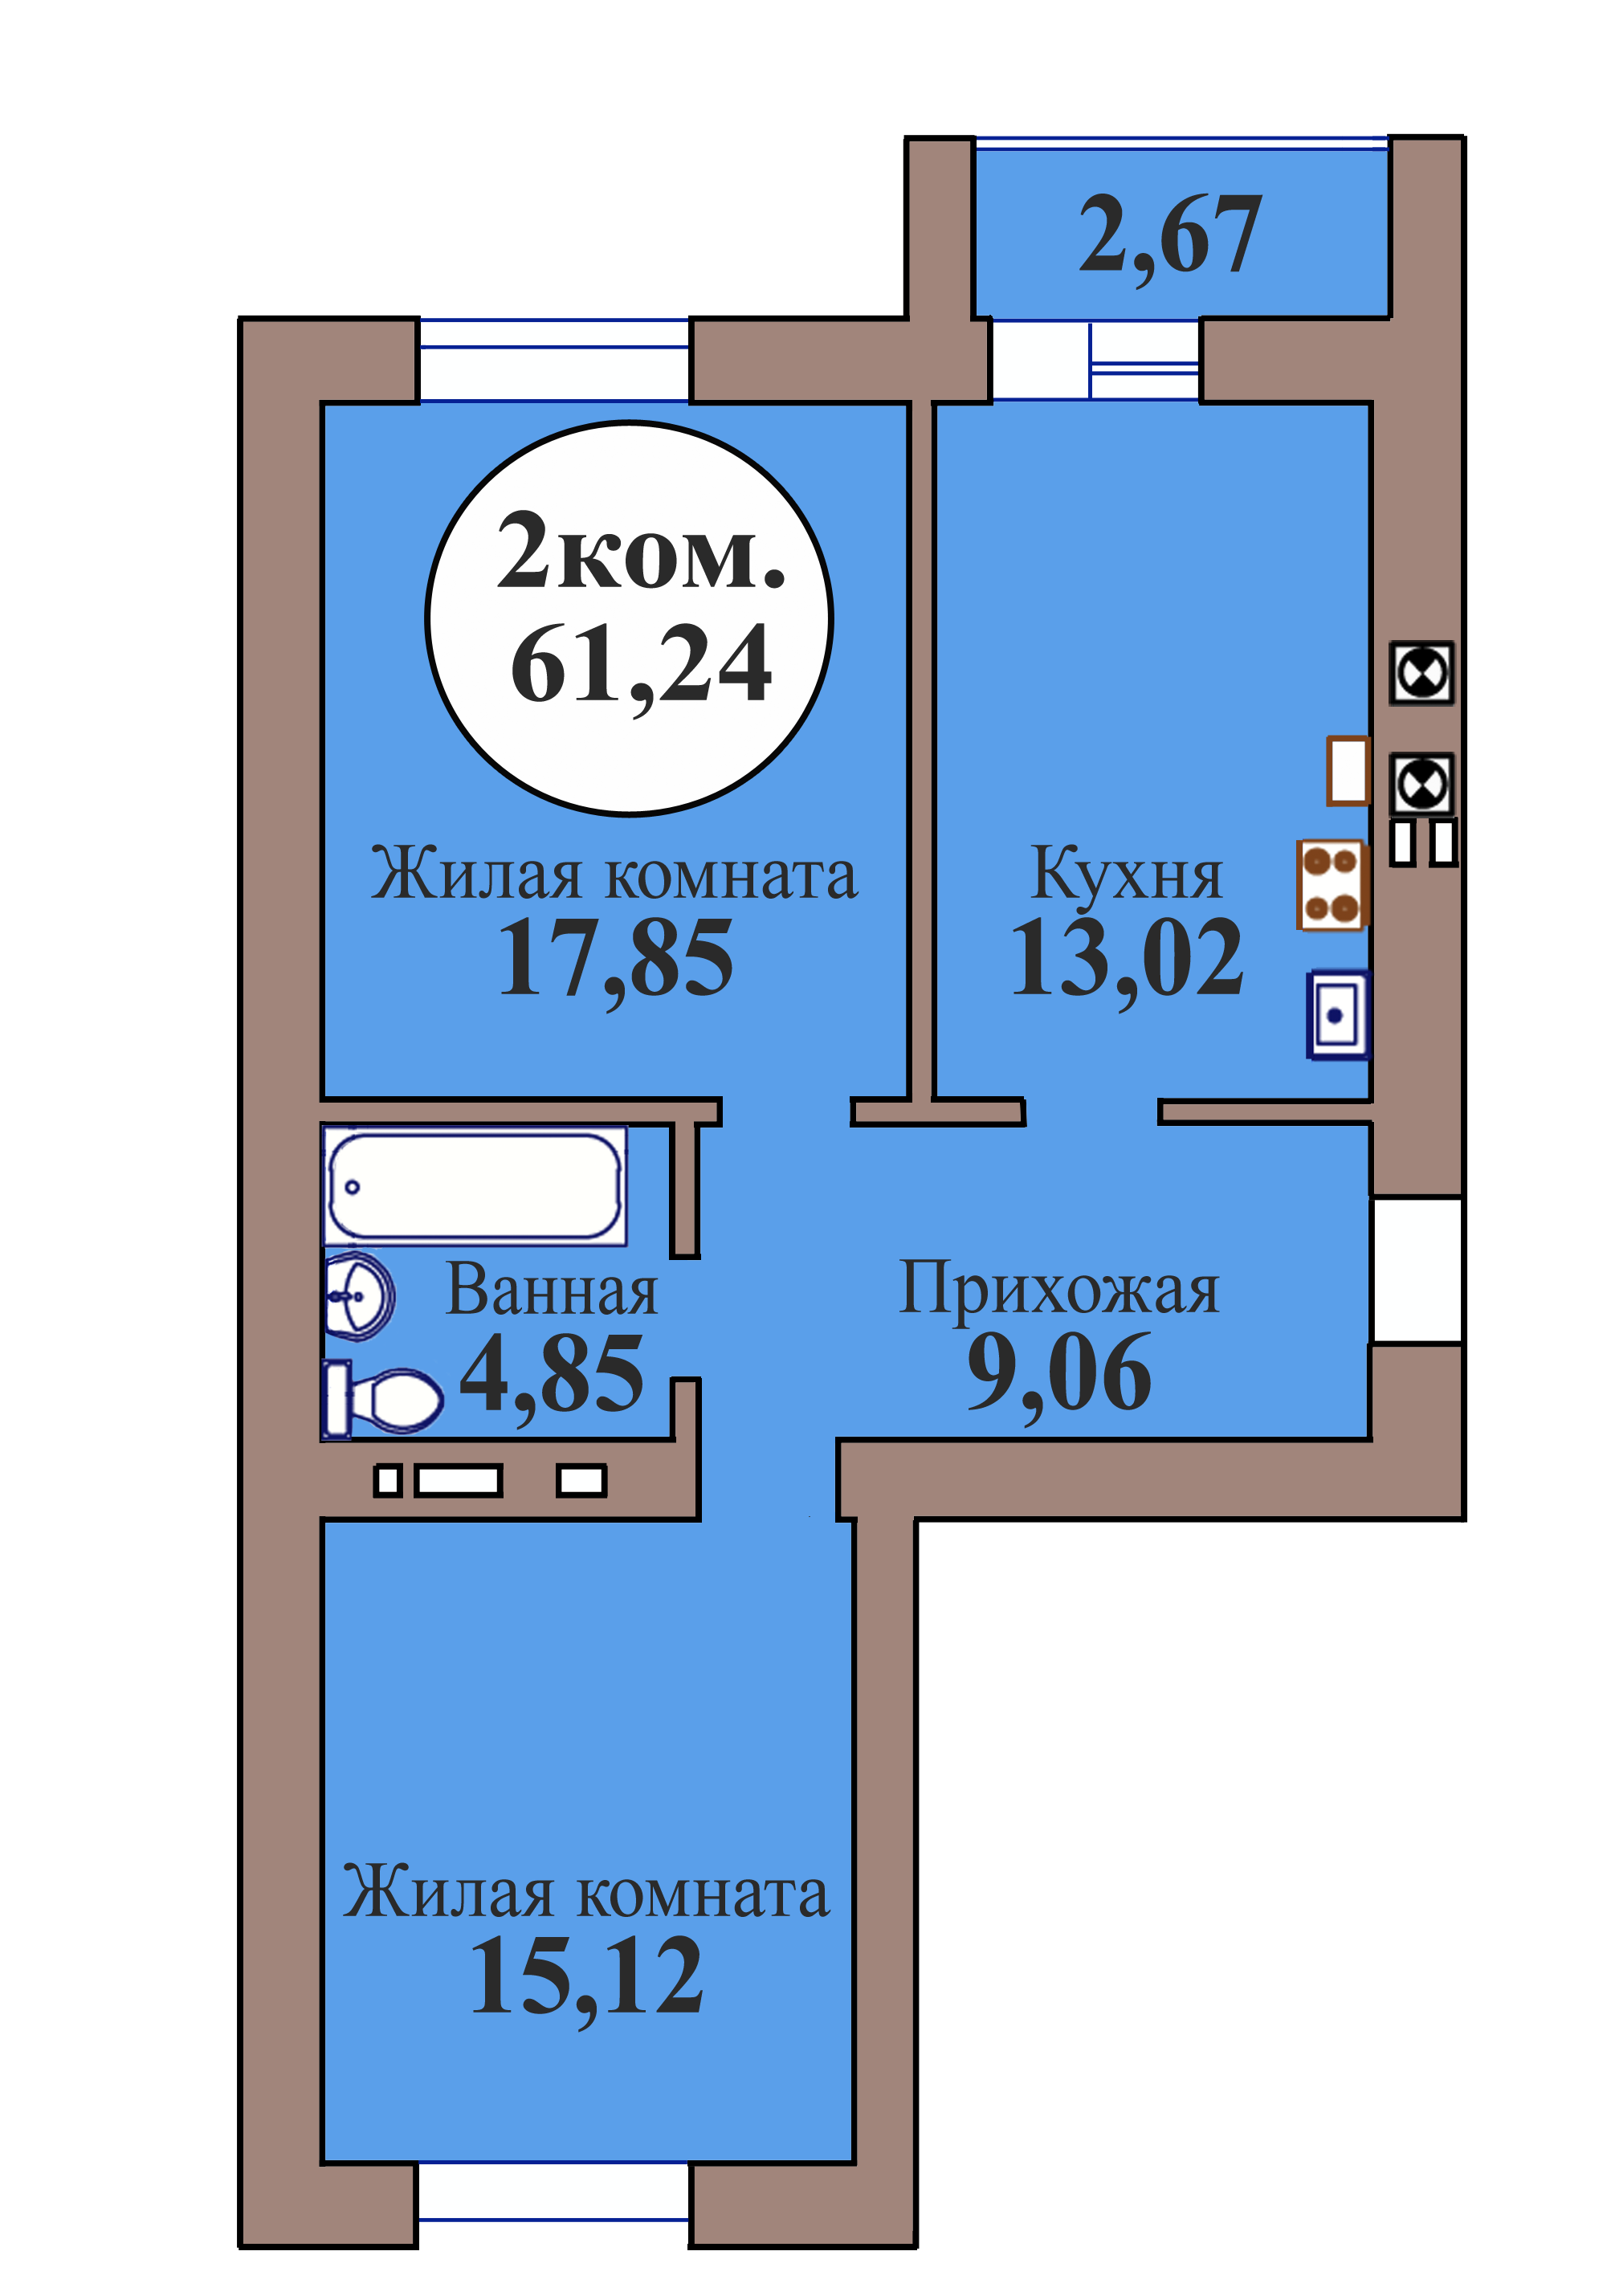 2-комн. кв. по пер. Калининградский, 5 кв. 139 в Калининграде